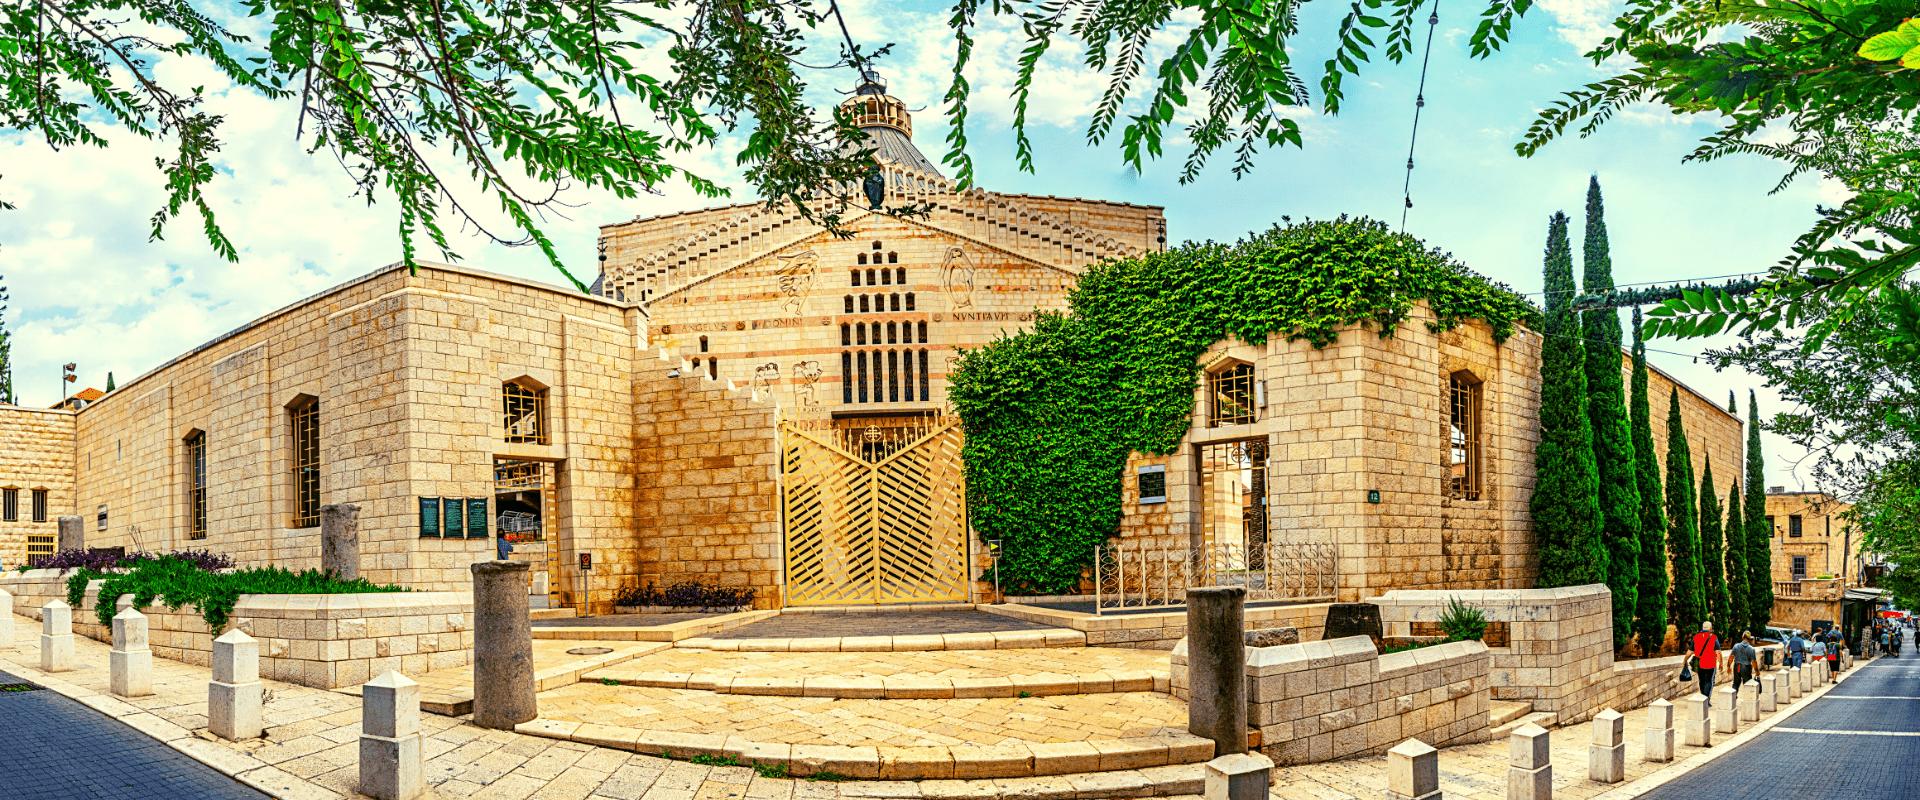 Holy Land Premium Tour of Israel - Group